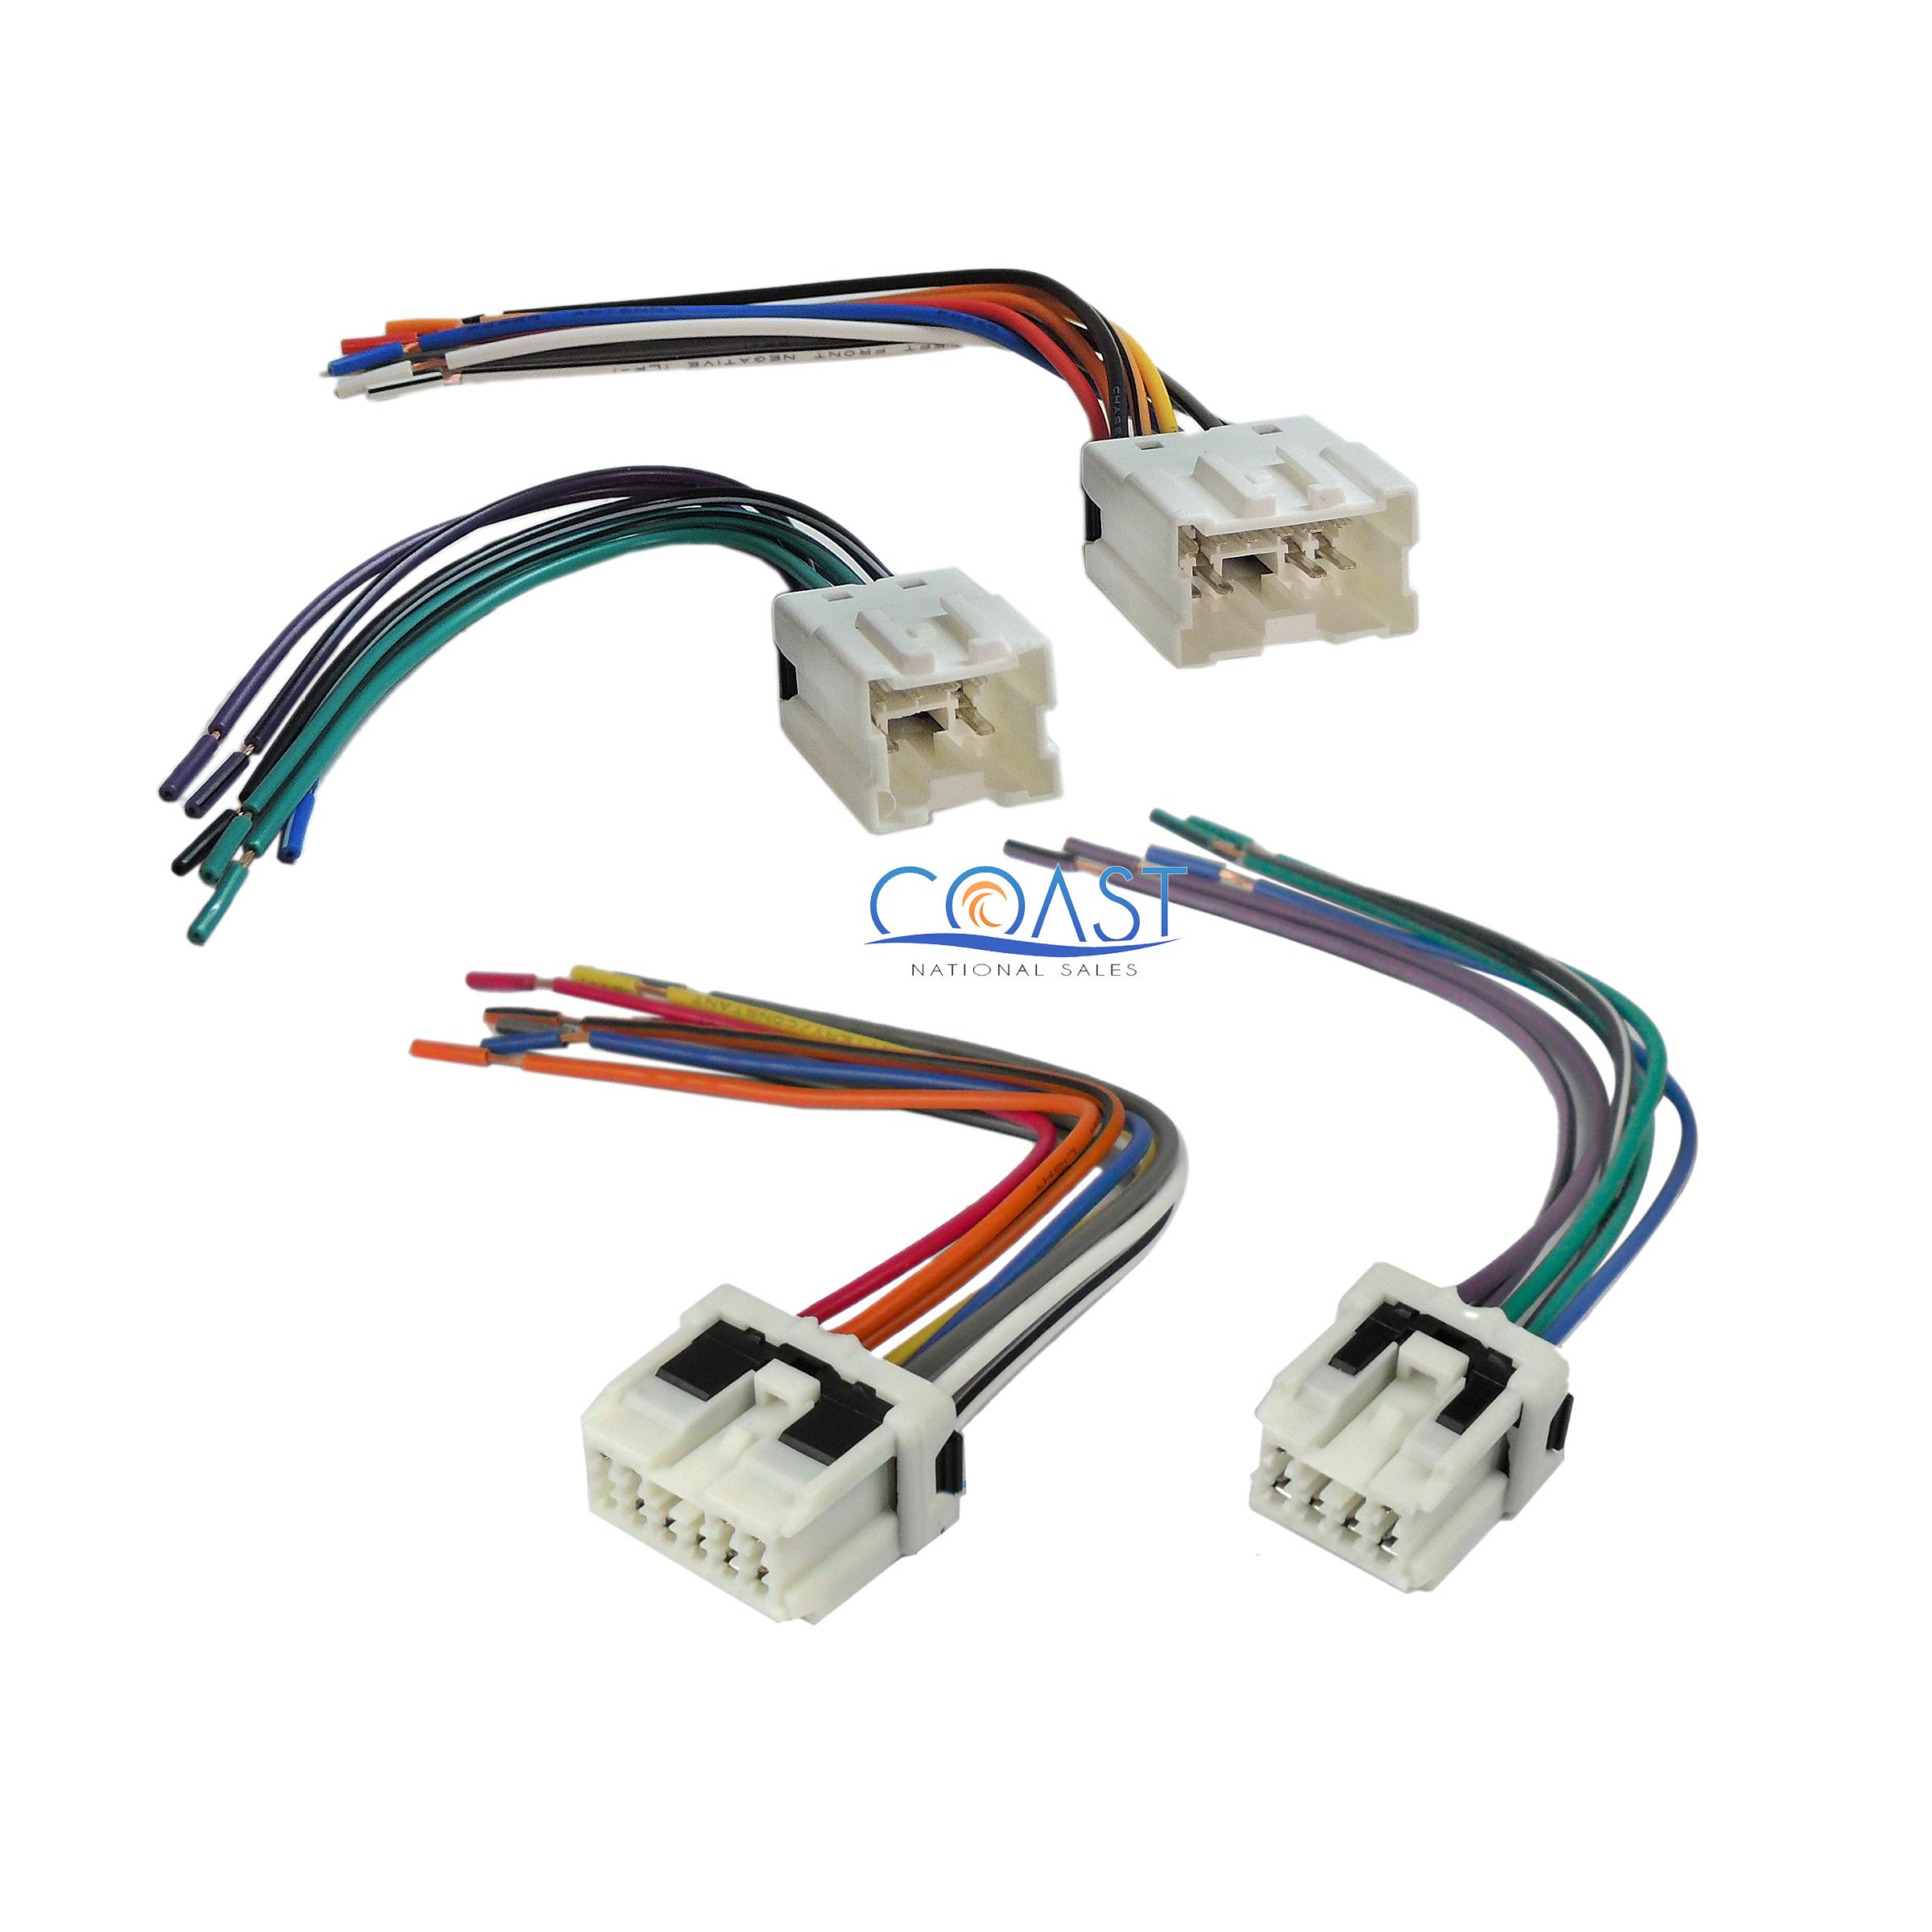 Metra 70-7550 Radio Install Wiring Harness for 1995-up Nissan Infiniti Vehicles